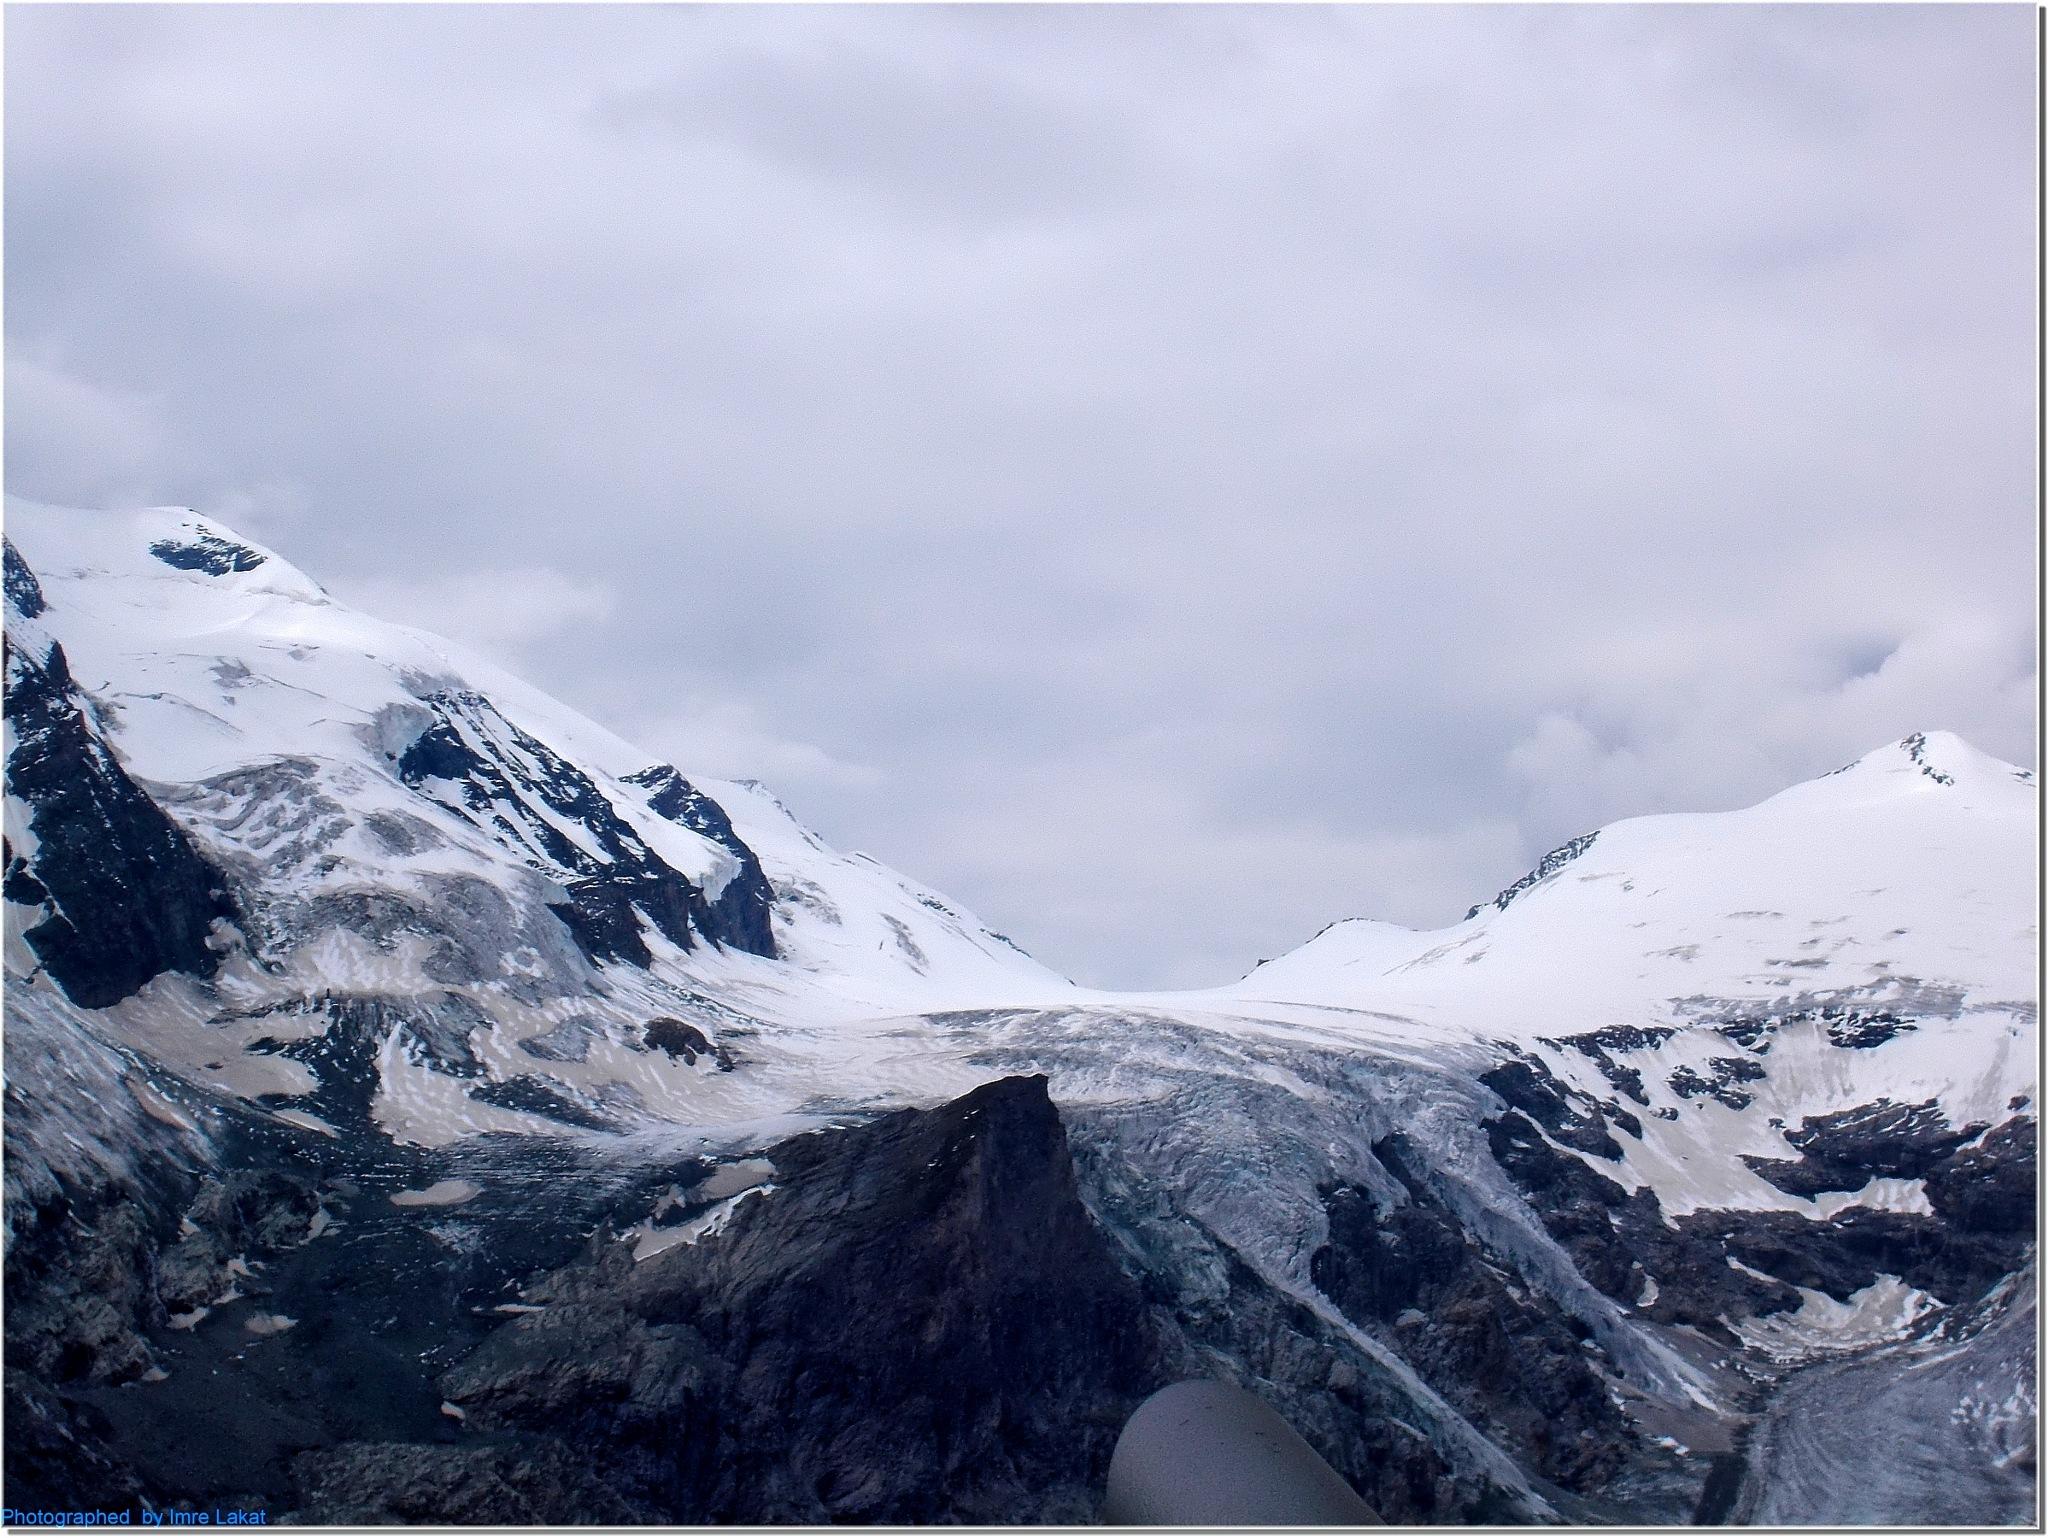 Glacier . Grossglockner Hochalpenstraße Heiligenblut, Austria  by Imre Lakat